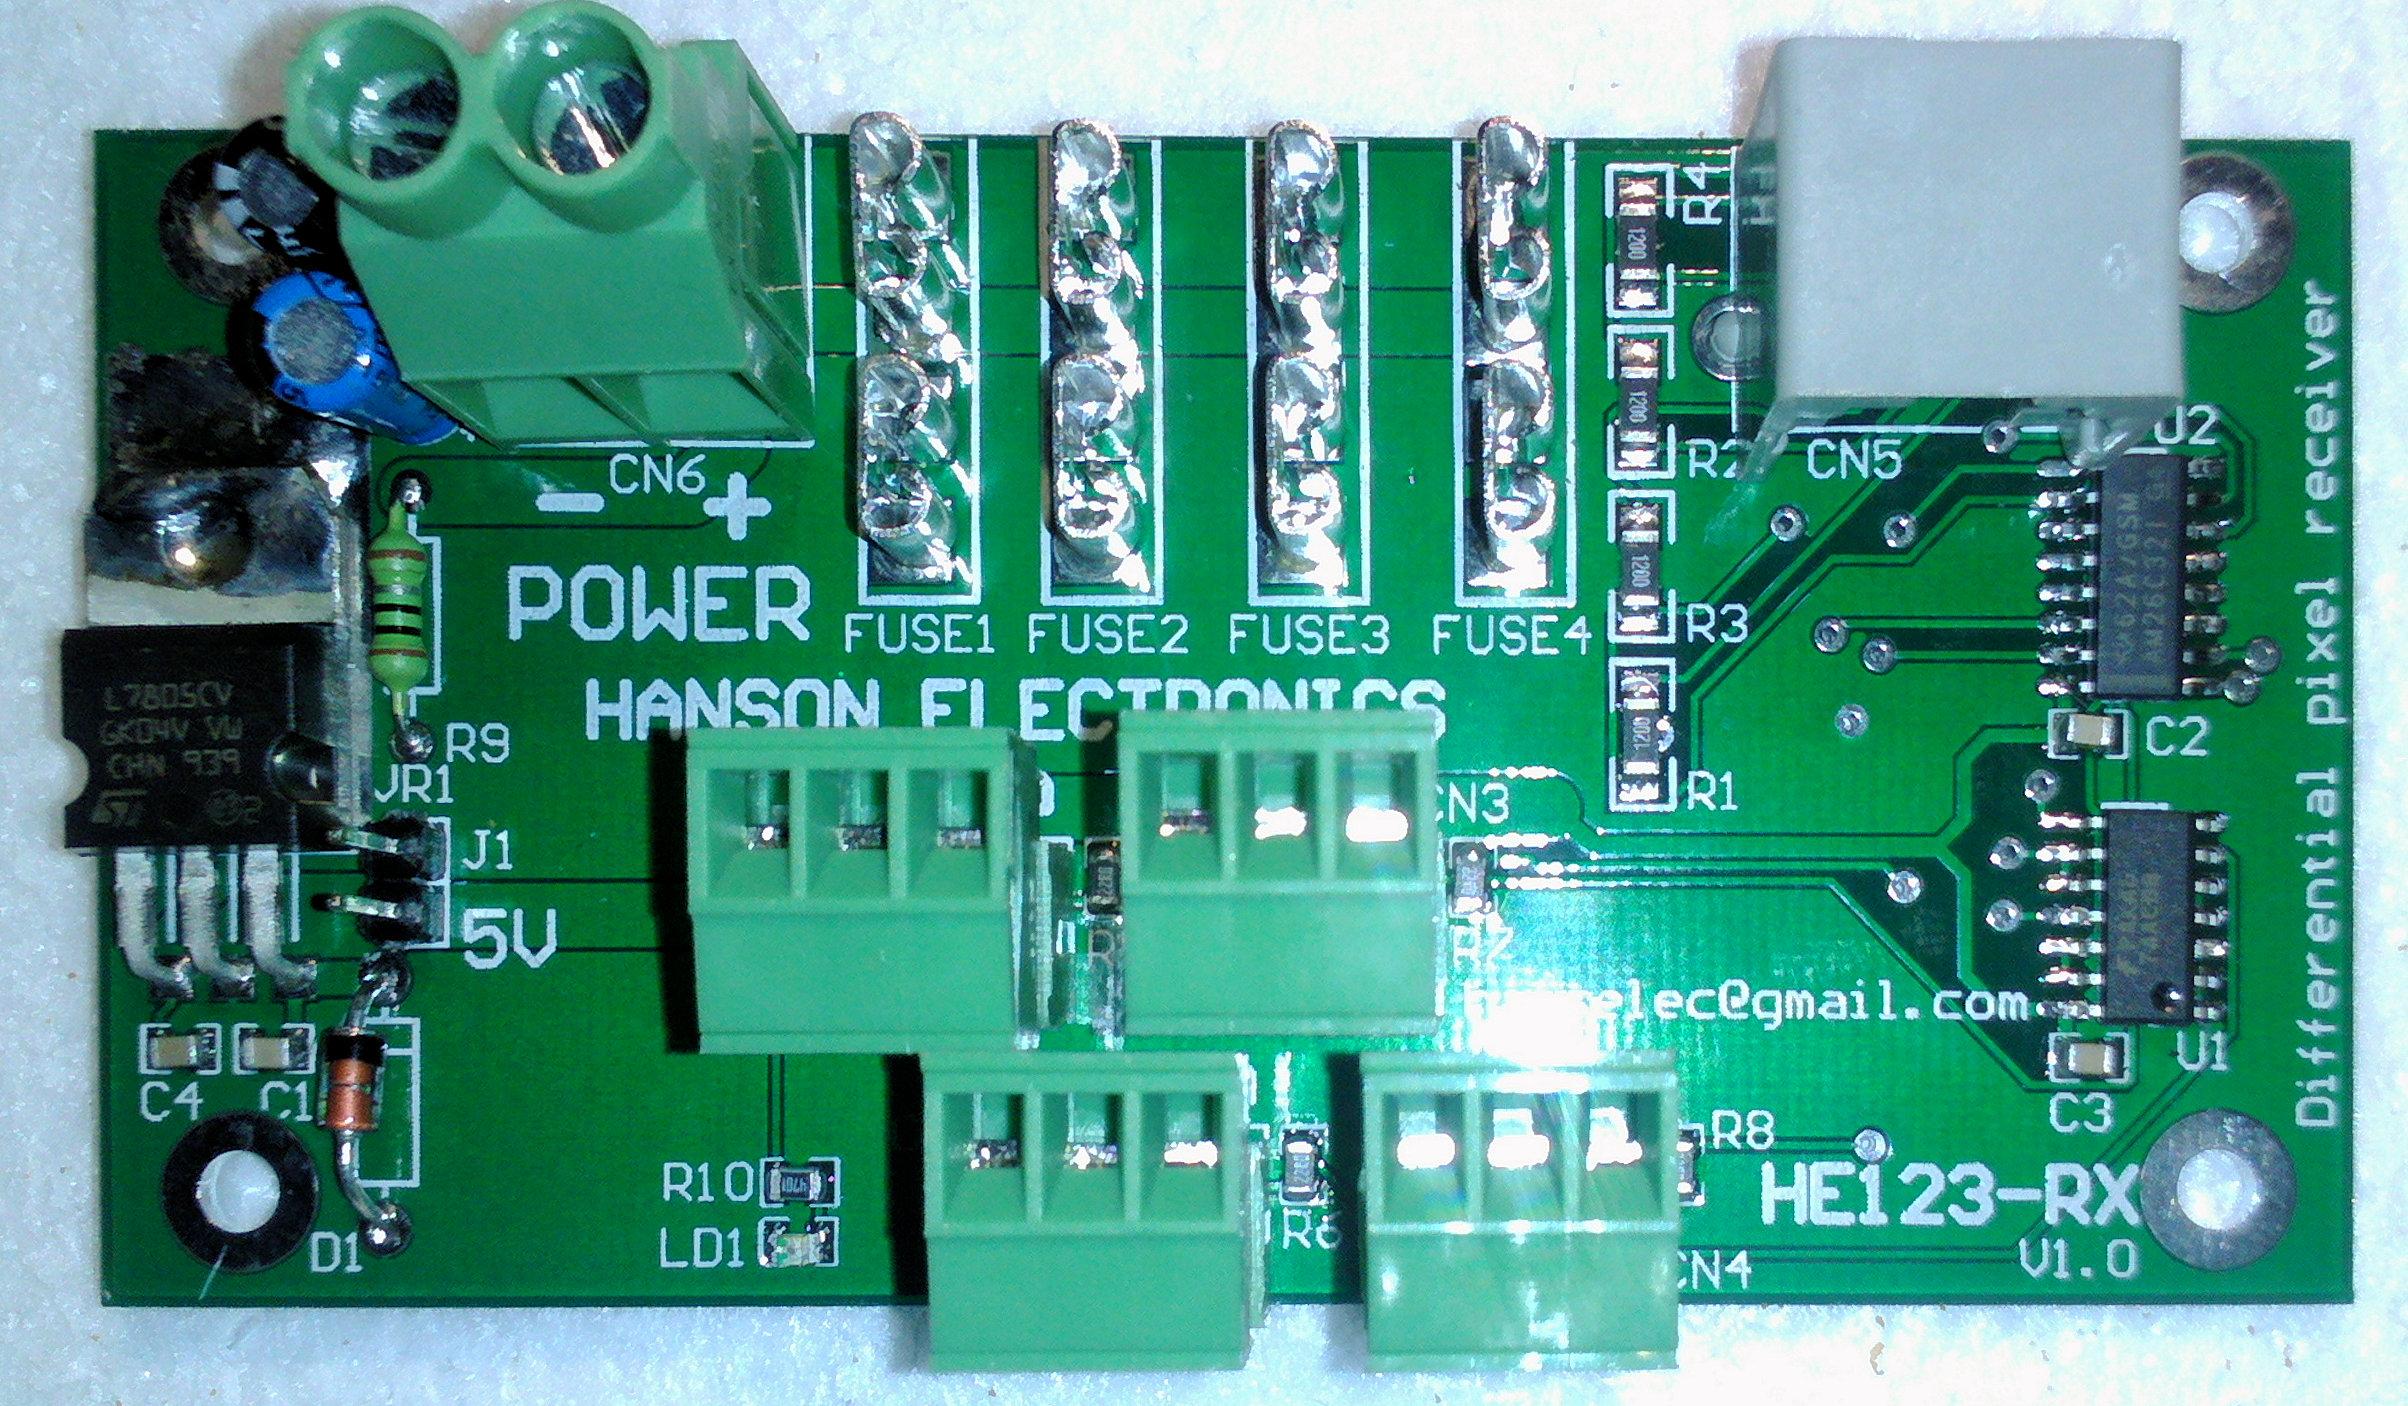 www.hansonelectronics.com.au